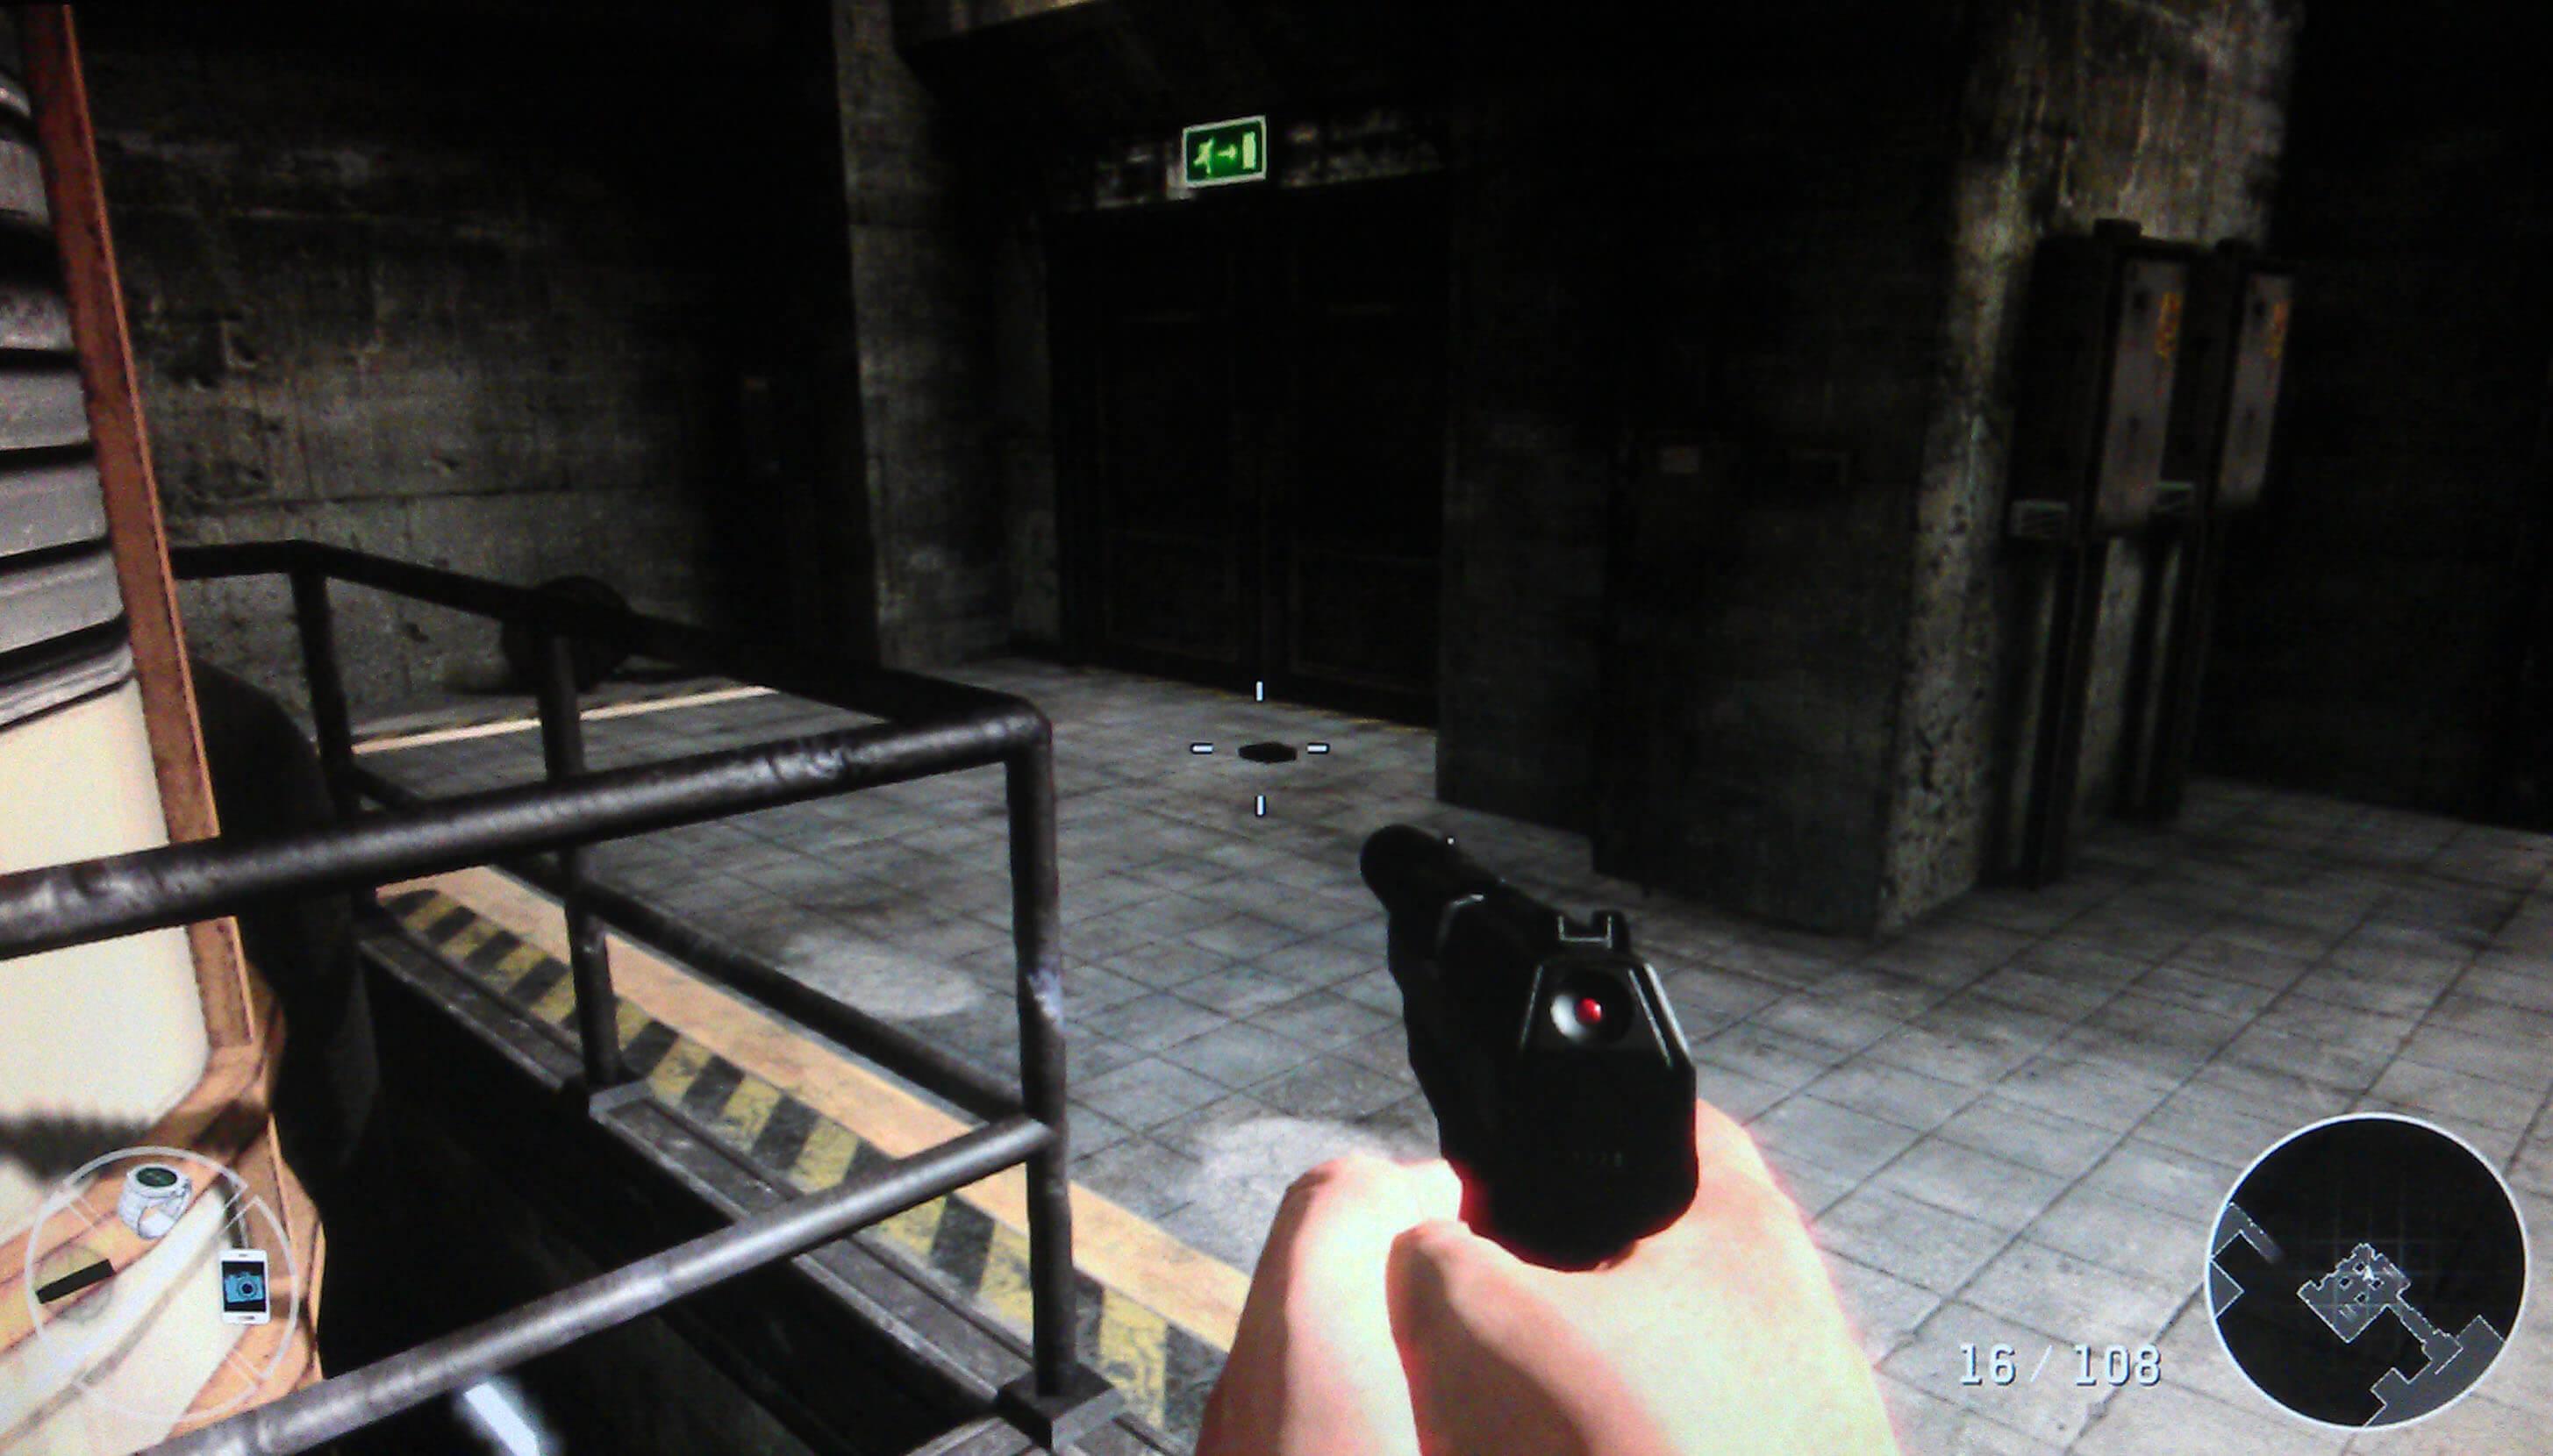 007 Legends Goldfinger Bio Intel #5